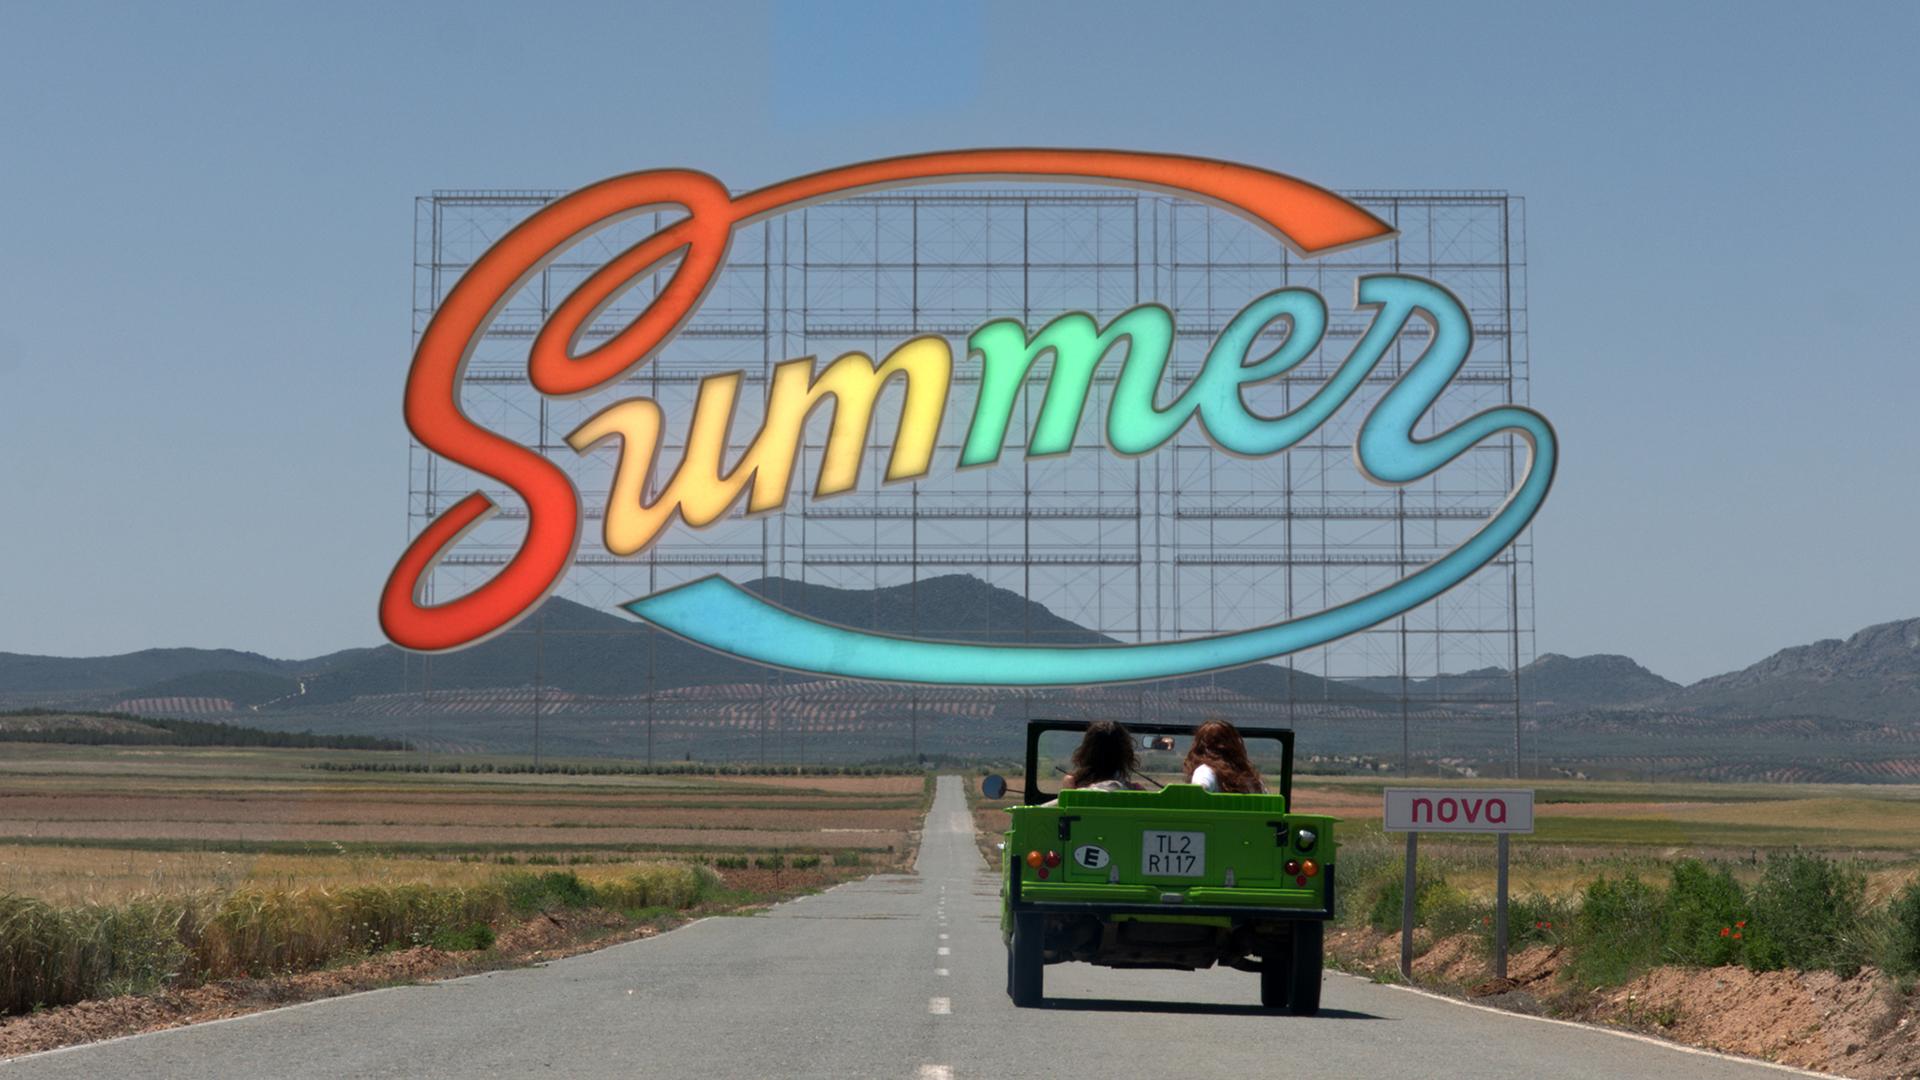 verano-canal-nova-acantilado-1920x1080